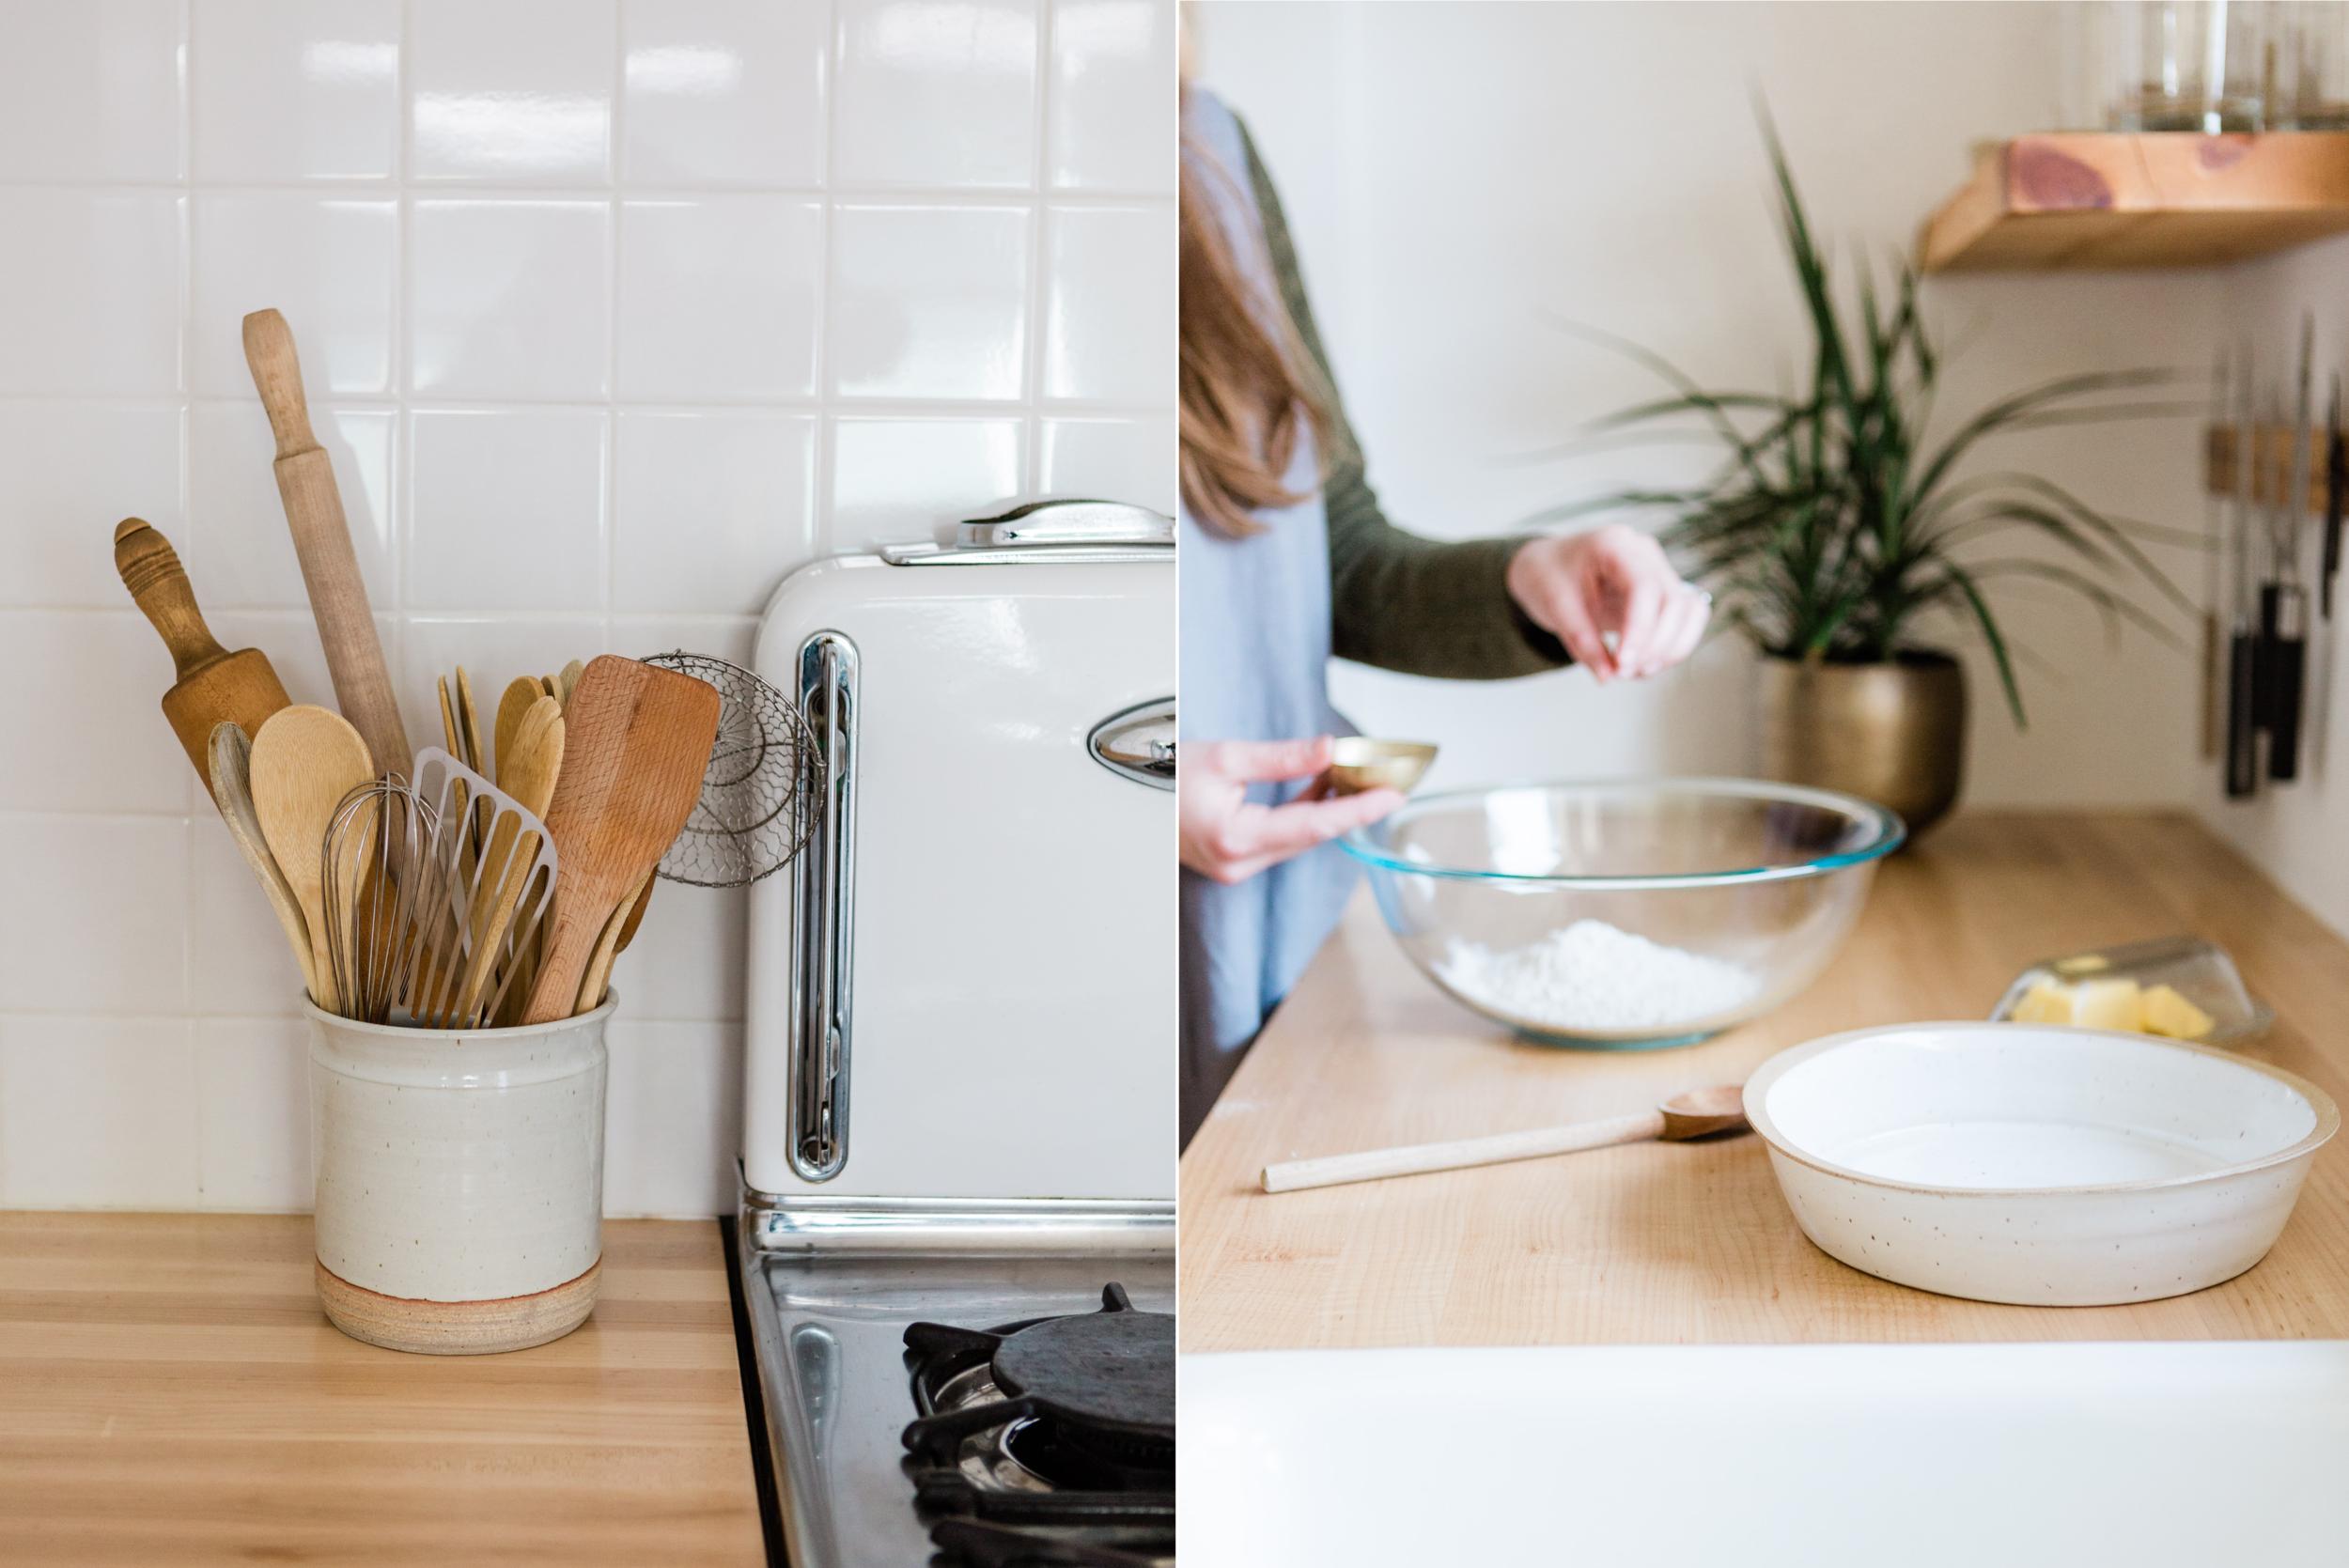 Ceramic utensil jar    Pie dish    Tunic dress linen apron    Metal bowls    Brass planters